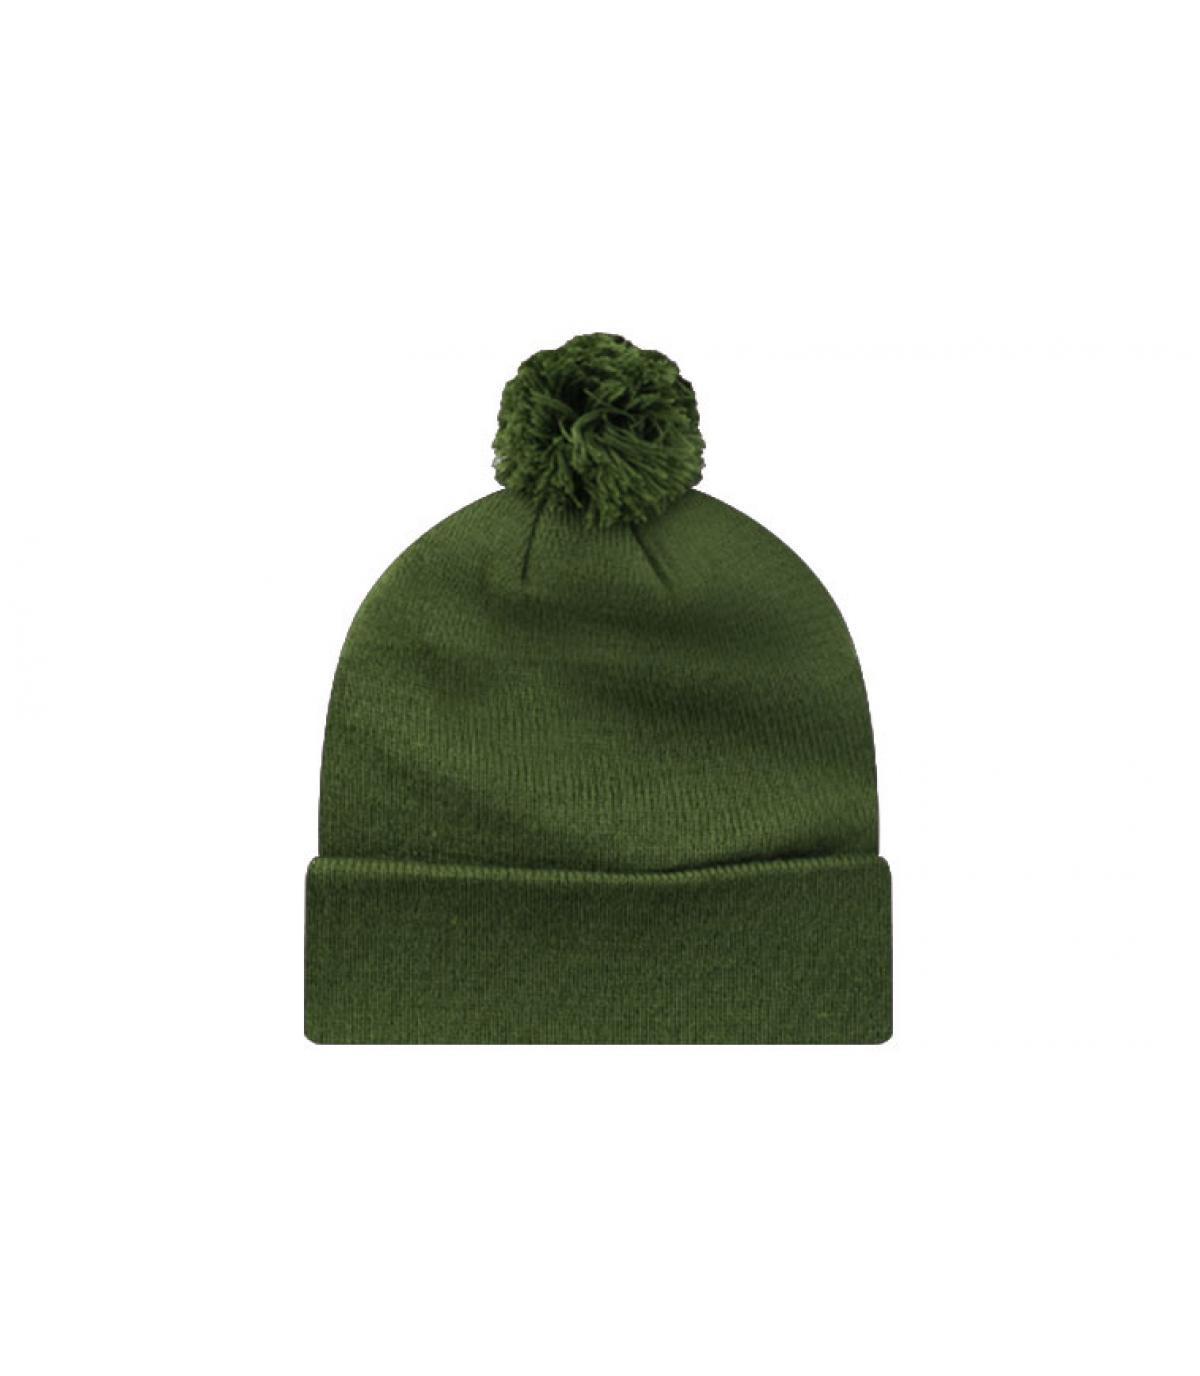 Bonnet pompon blank moss green